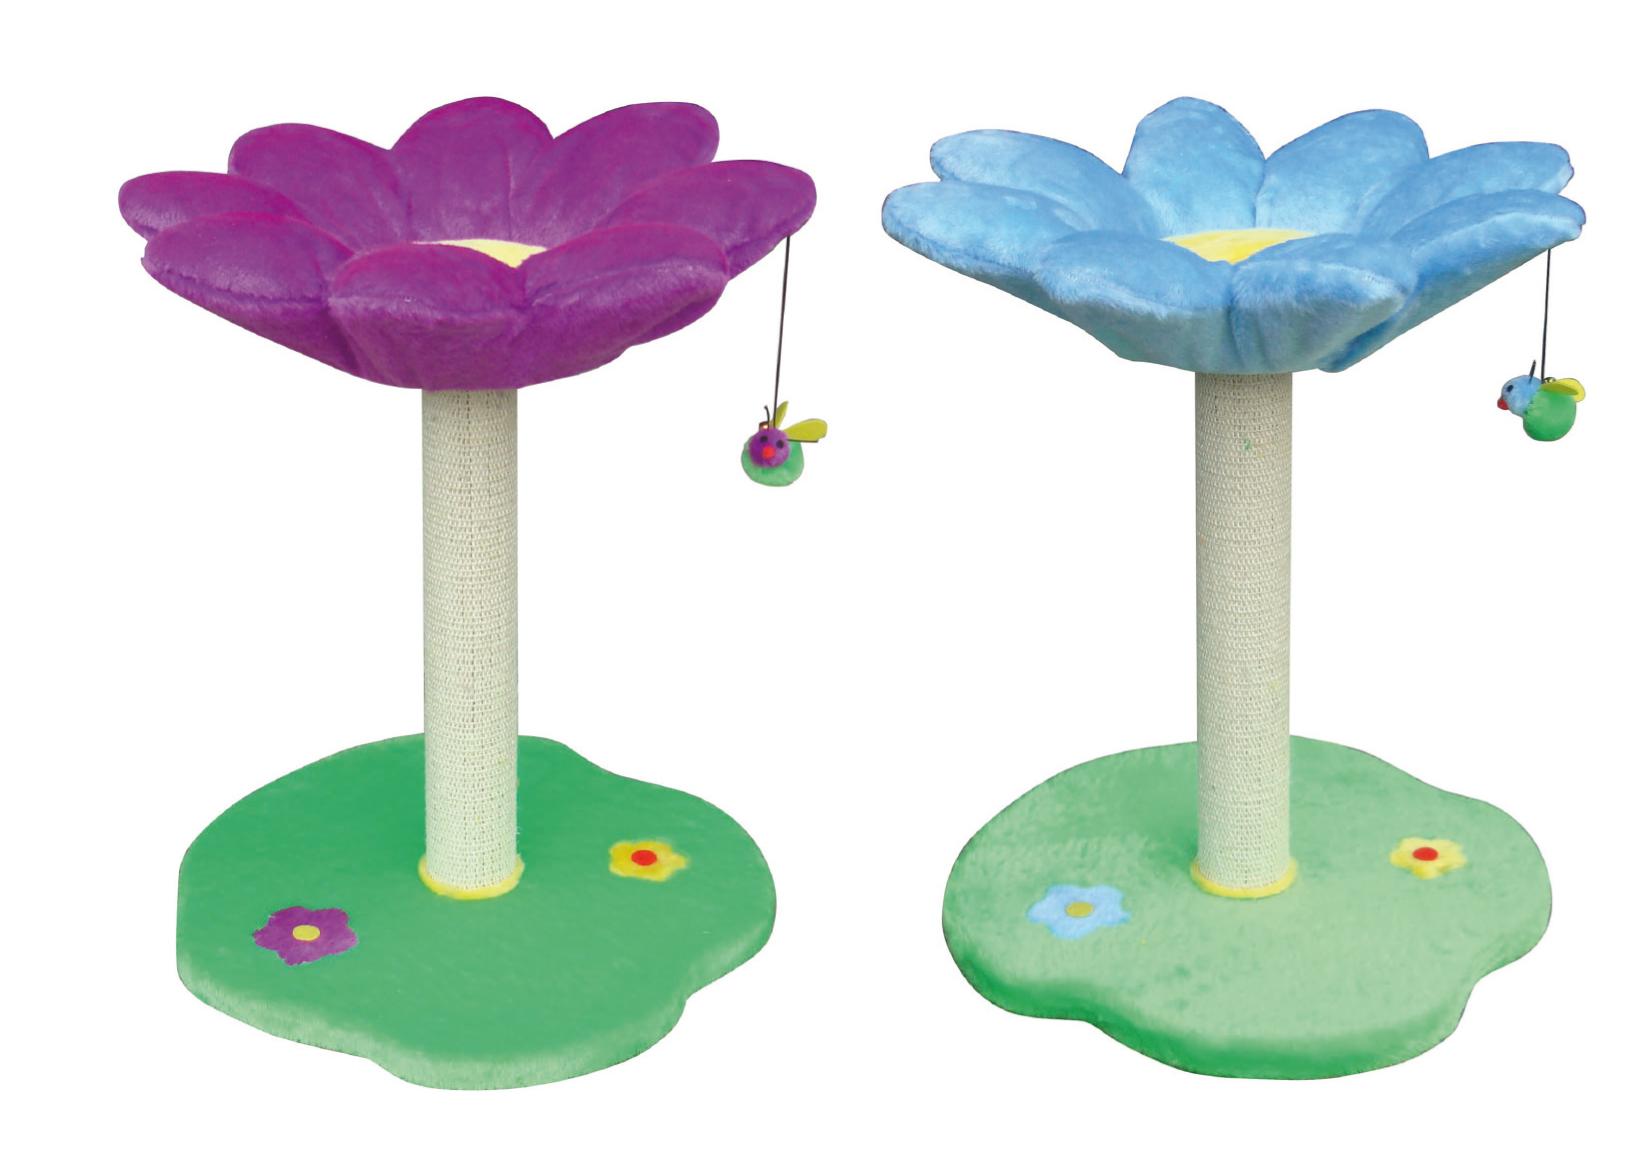 croci Когтеточка-столбик Цветок, 40*40*44 см, в ассорт. C6020085